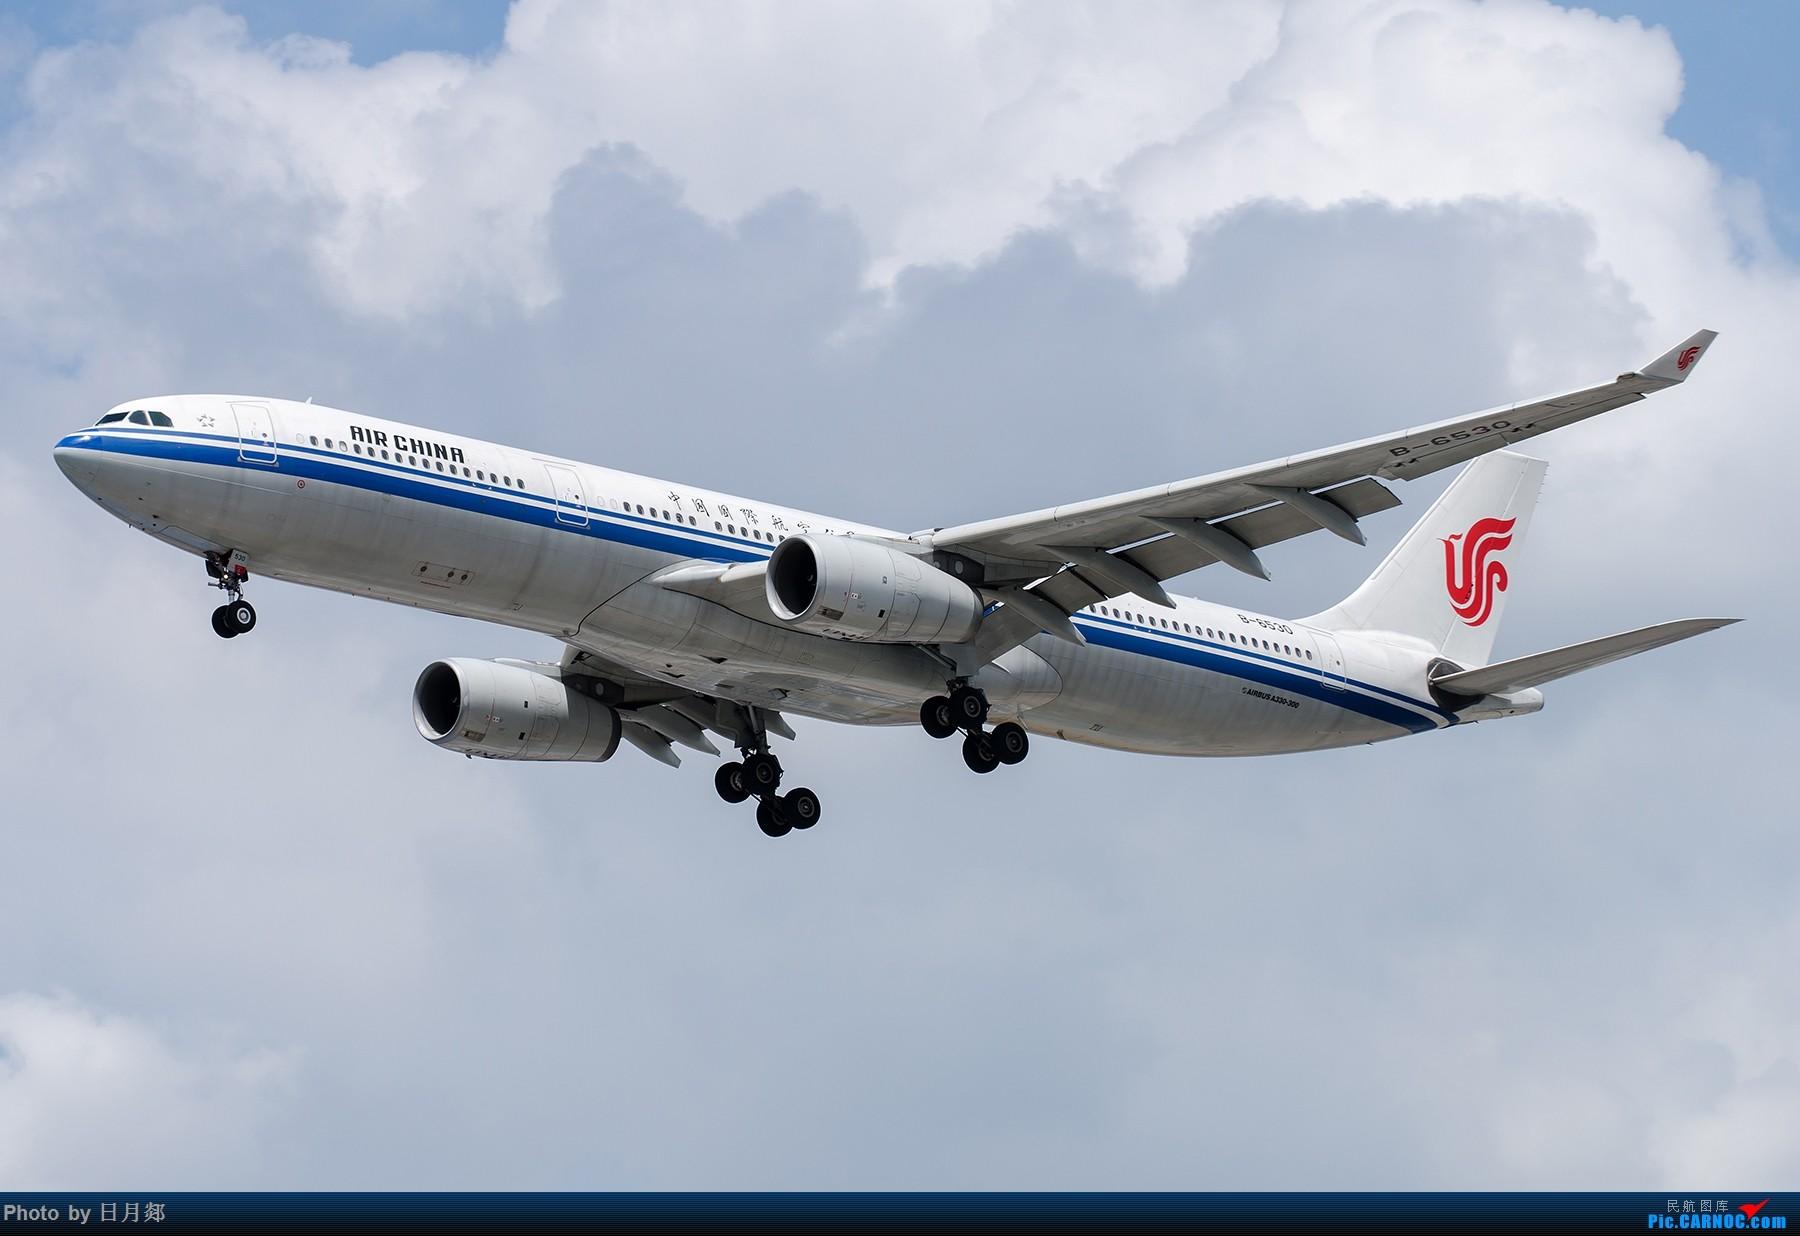 Re:[原创]【SHA拍机*1800大图】图要抓紧发,不然就要炒冷饭,大头镇贴 AIRBUS A330-300 B-6530 中国上海虹桥国际机场